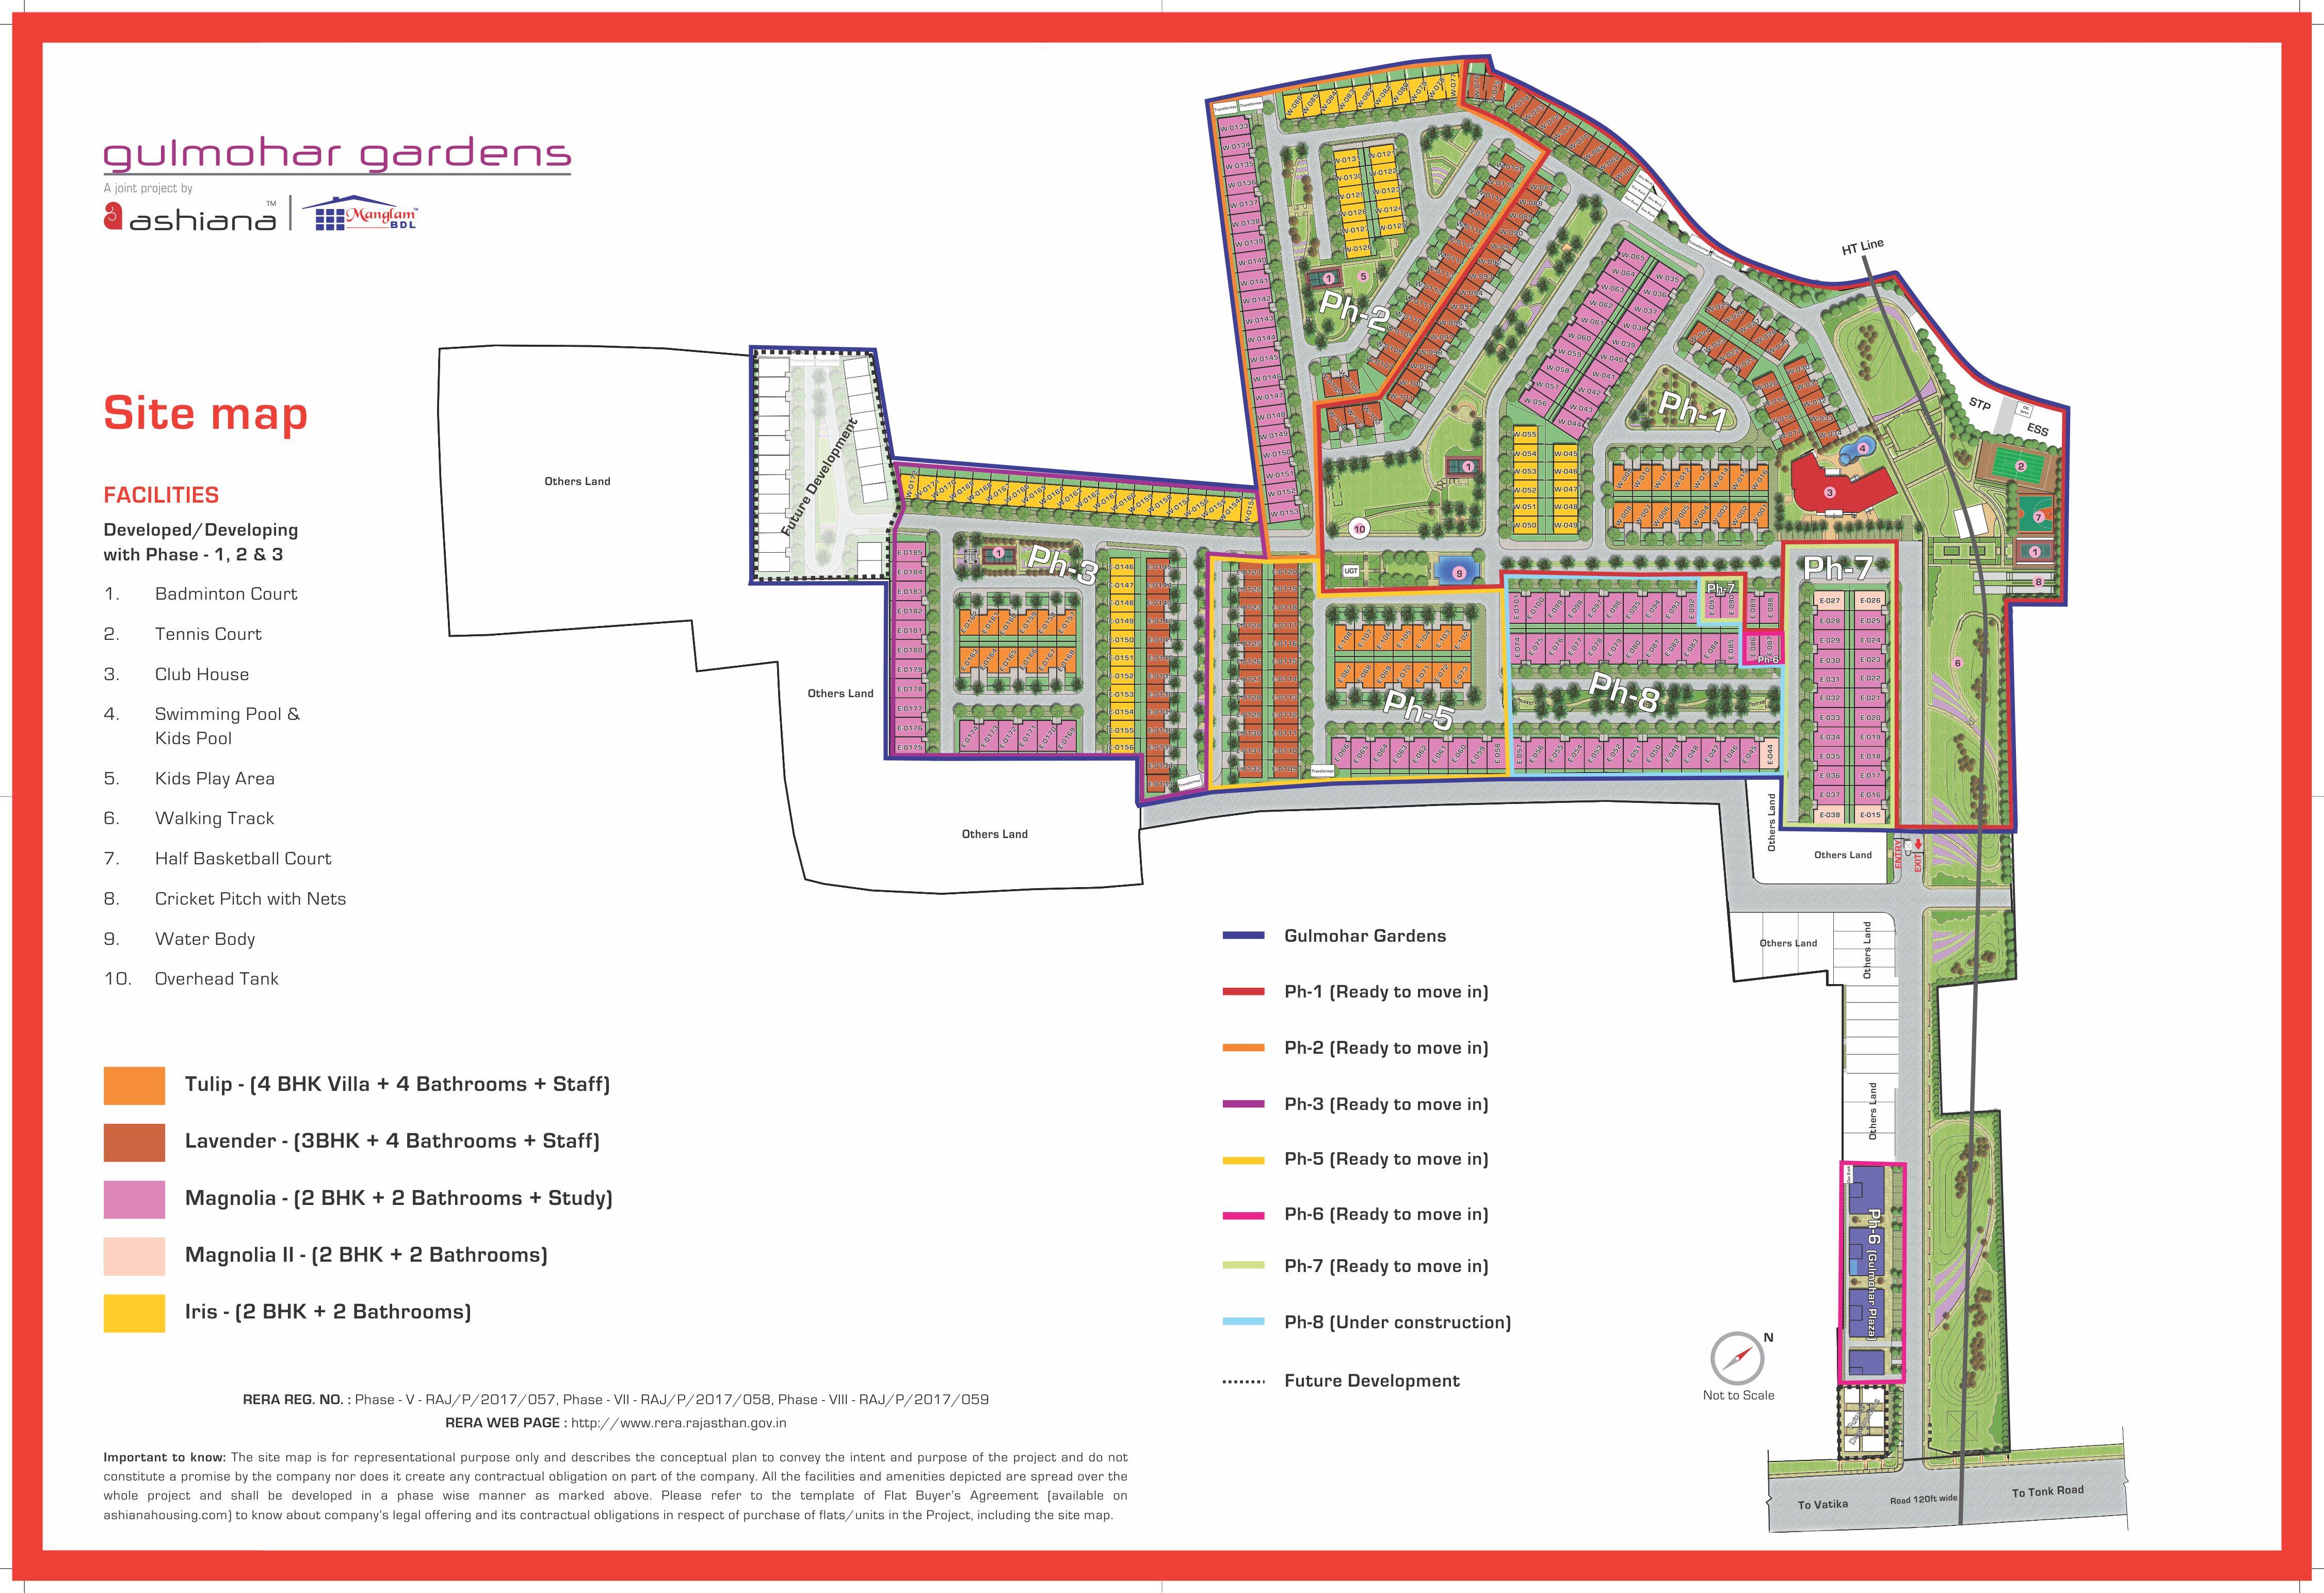 2 Bhk Flats In Jaipur Tonk Road Property Rates Golmar Intercom Wiring Diagram Site Map